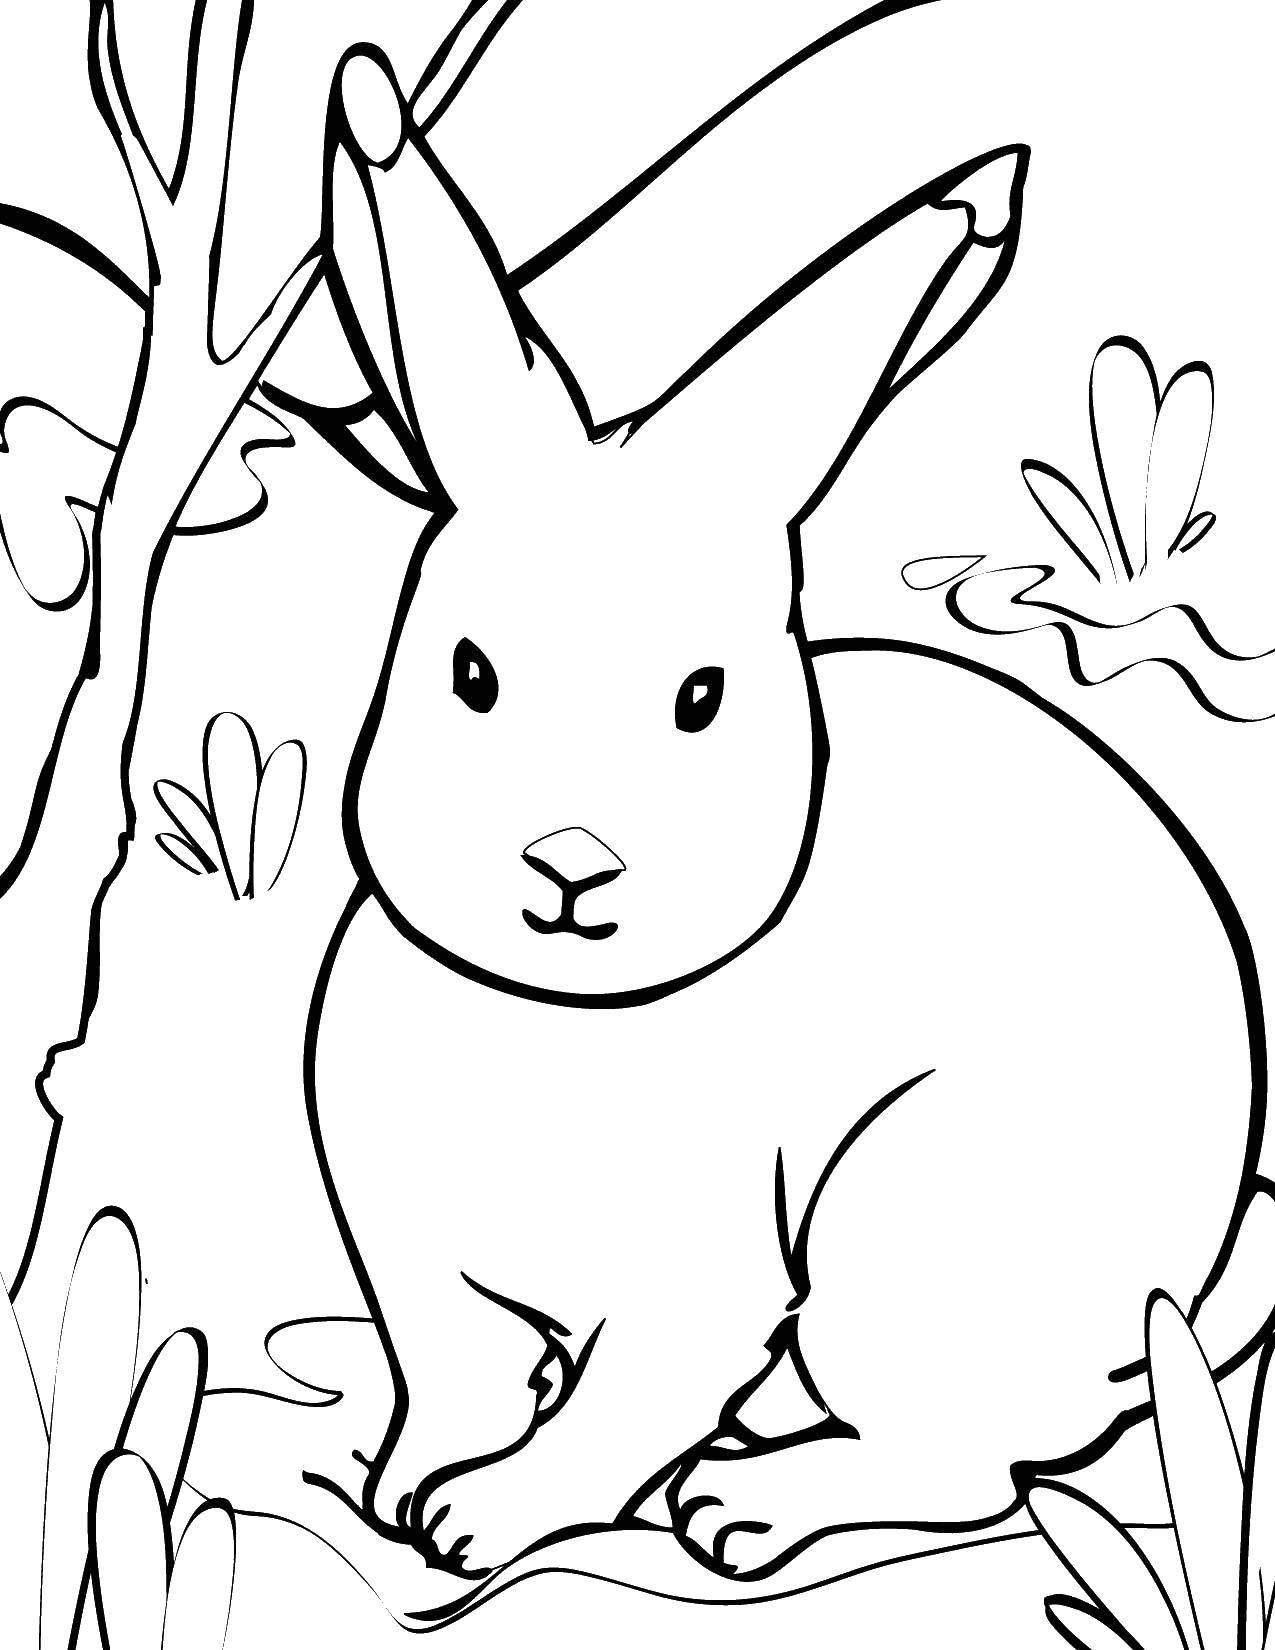 Coloring sheet Animals Download monitor, printer, speakers.  Print ,coloring,